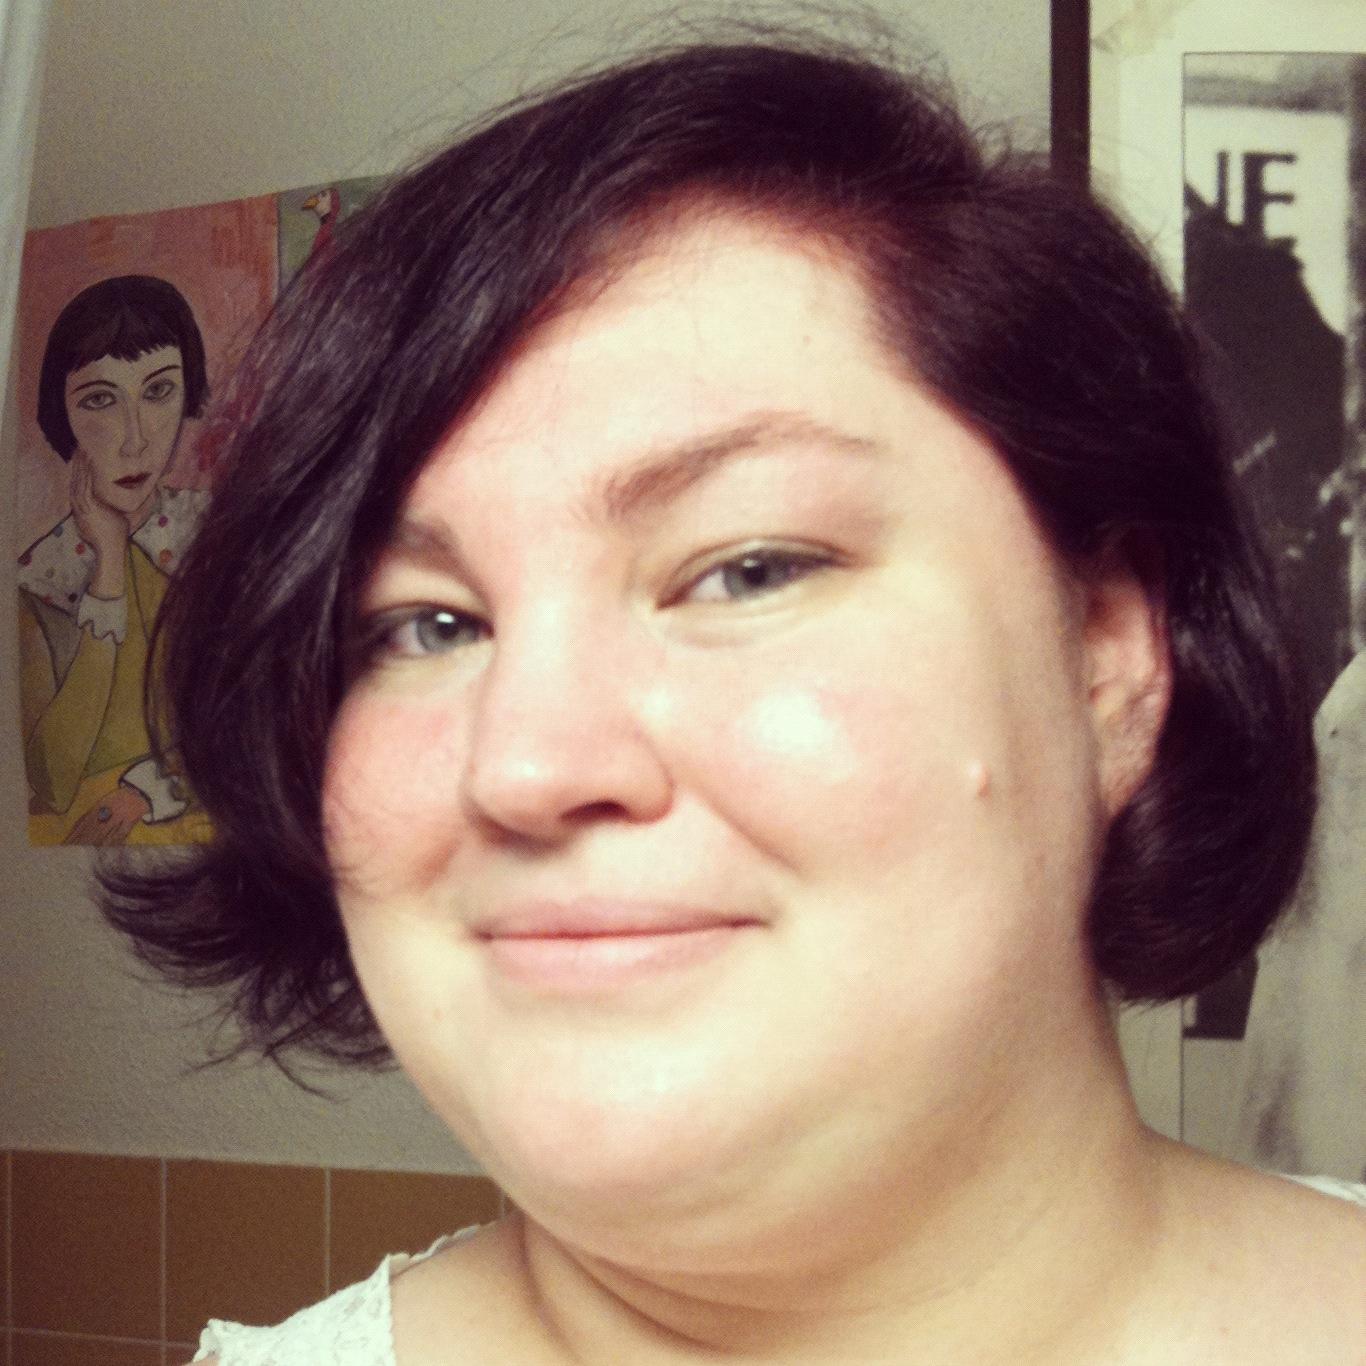 Short Hair, Big Girl: Eggplant Fantasy!